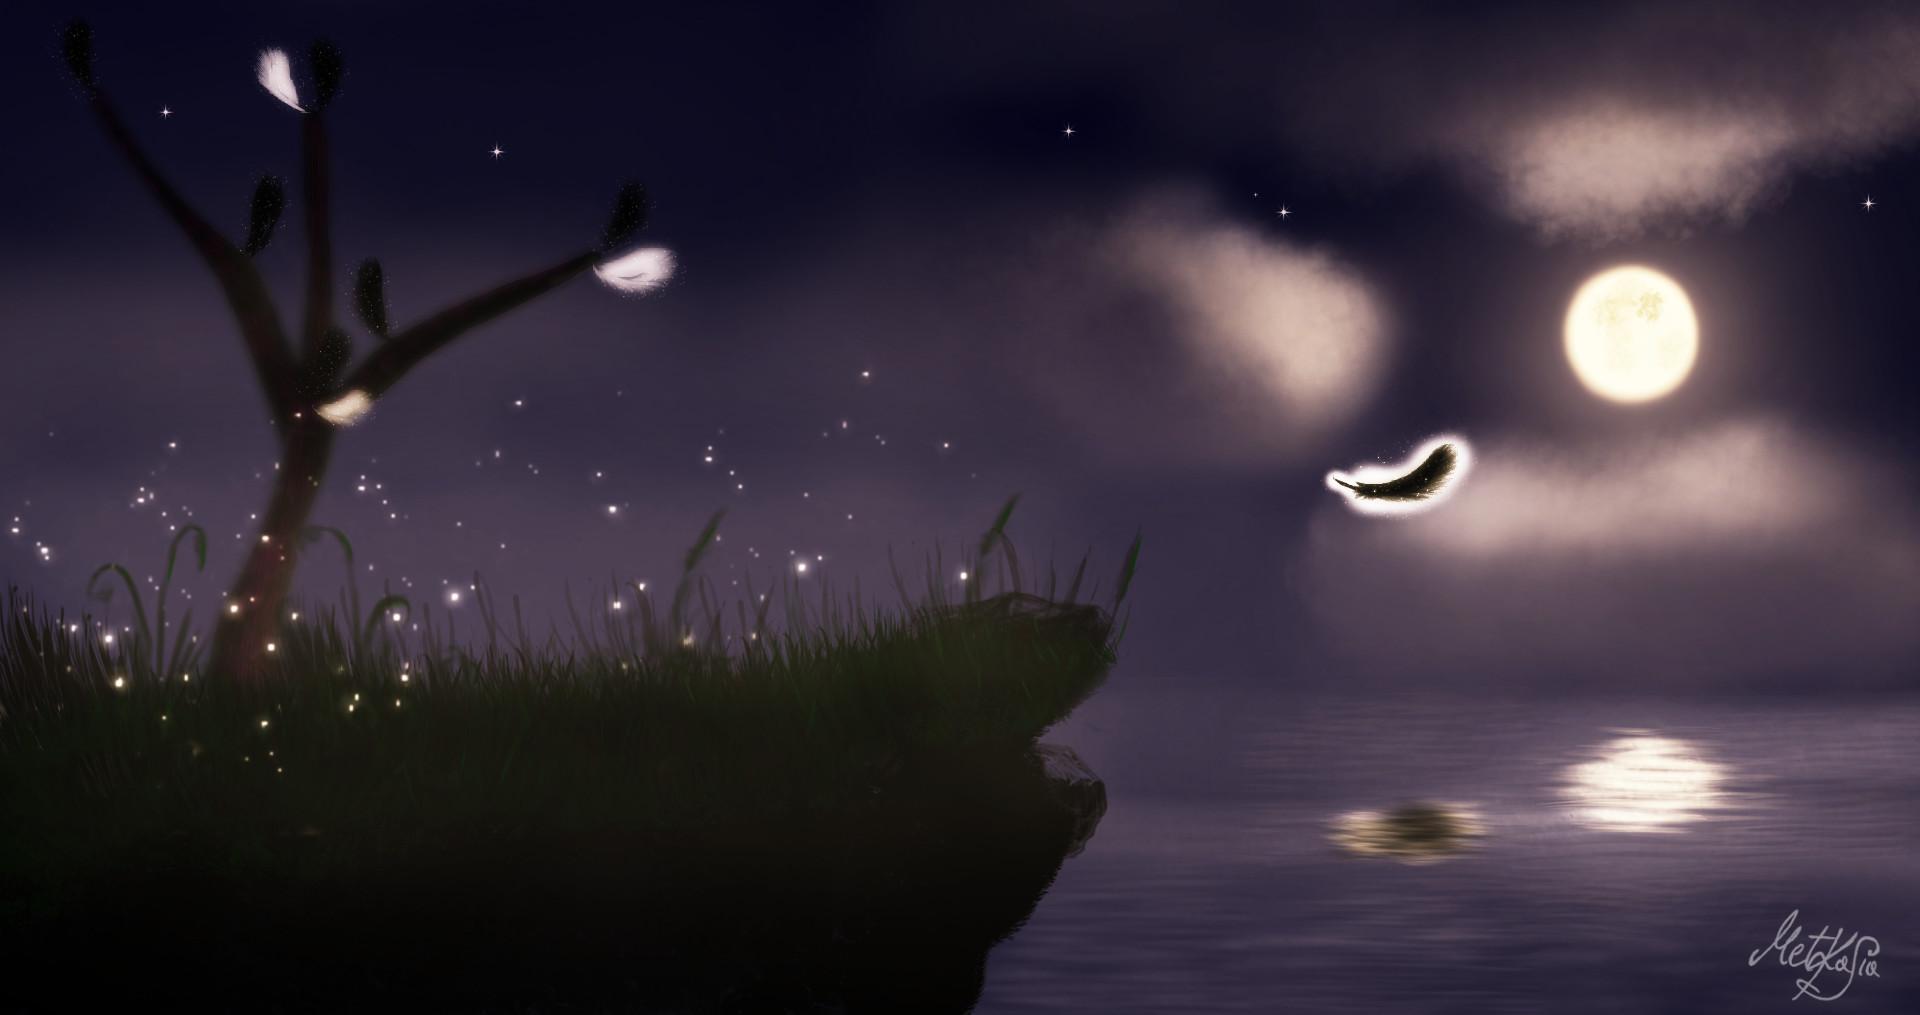 Kasia michalak magic of moonlight